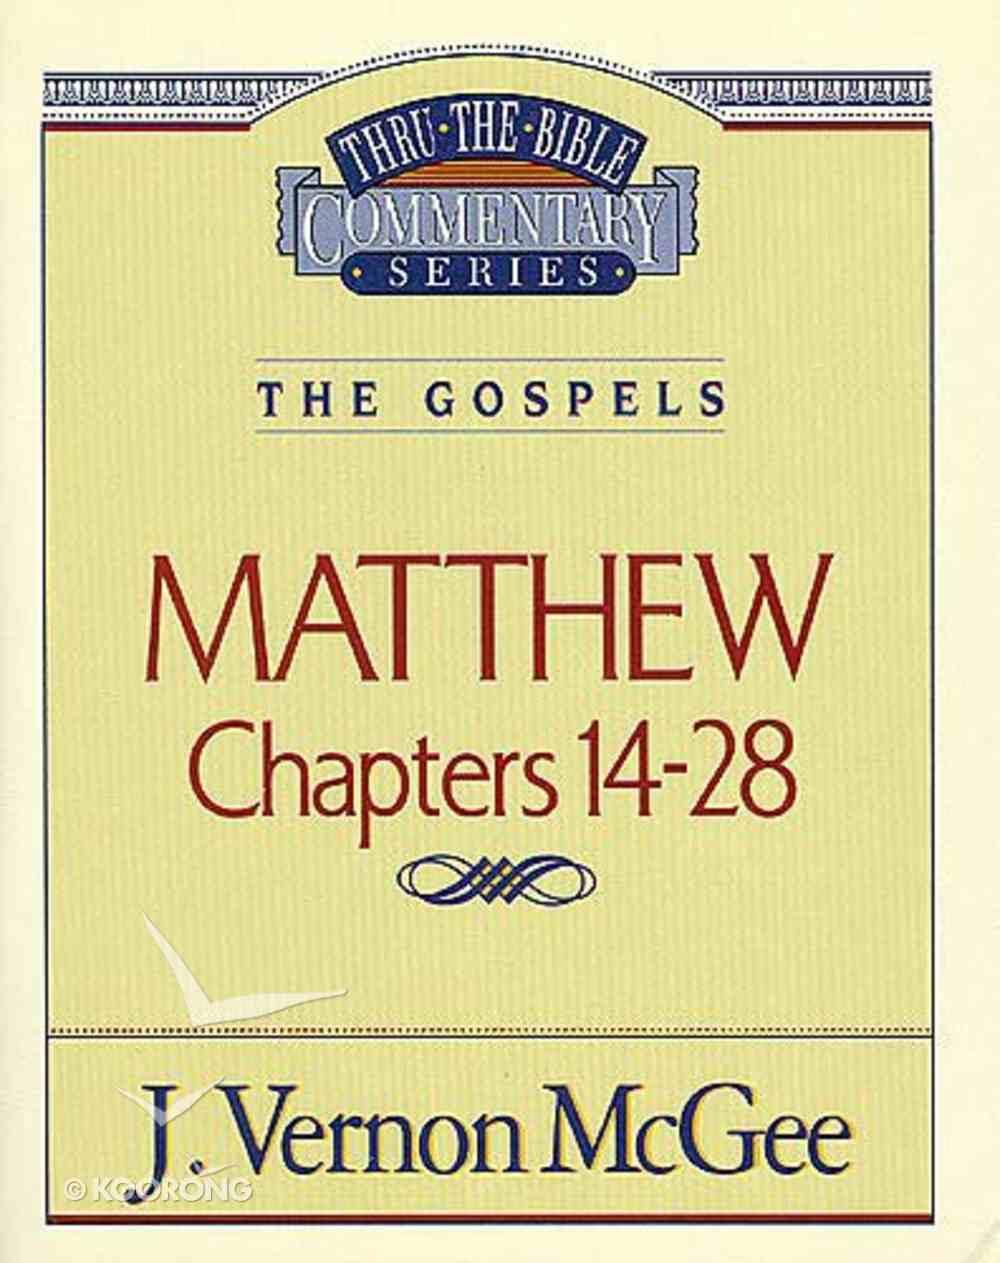 Thru the Bible NT #35: Matthew (Volume 2) (#35 in Thru The Bible New Testament Series) Paperback